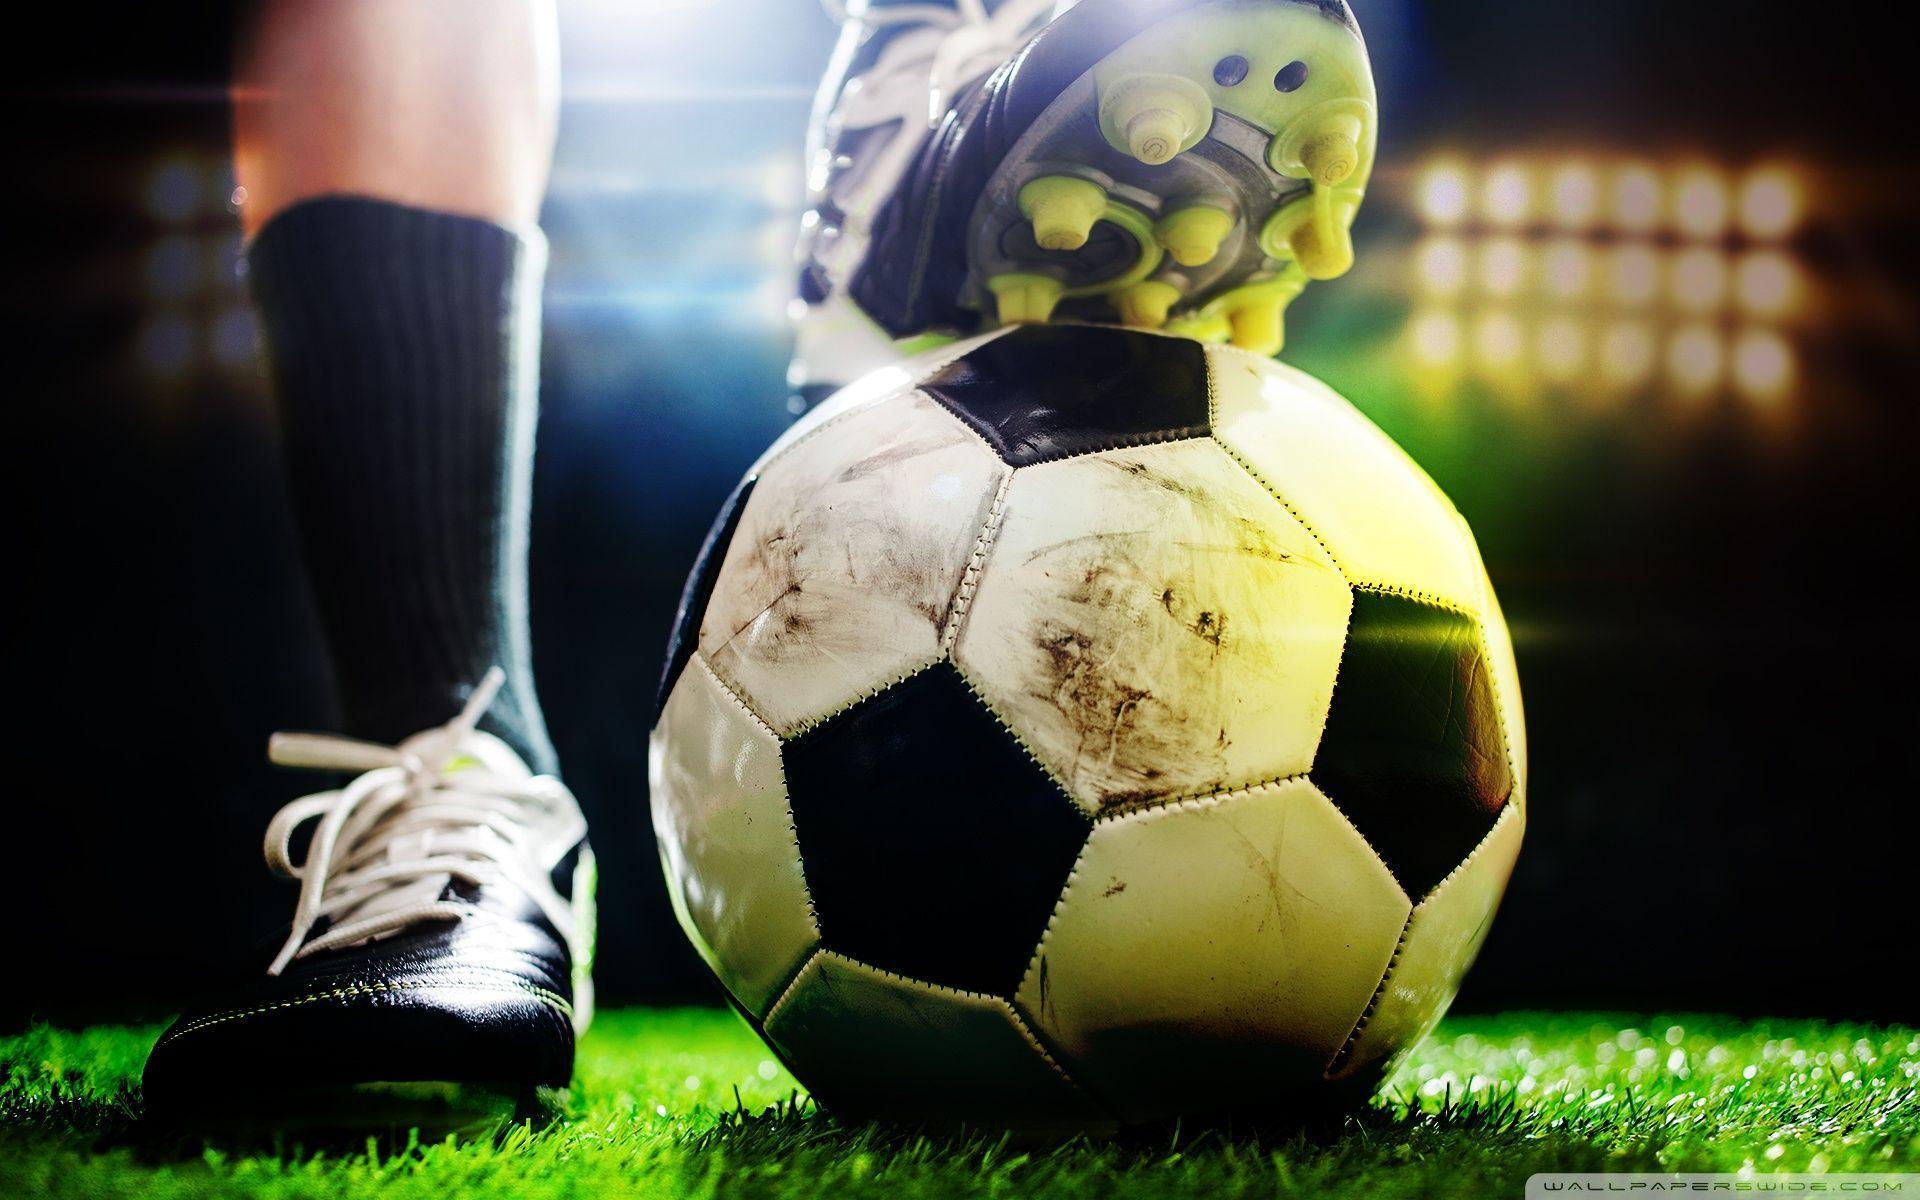 Football Hd Wallpapers Top Free Football Hd Backgrounds Wallpaperaccess